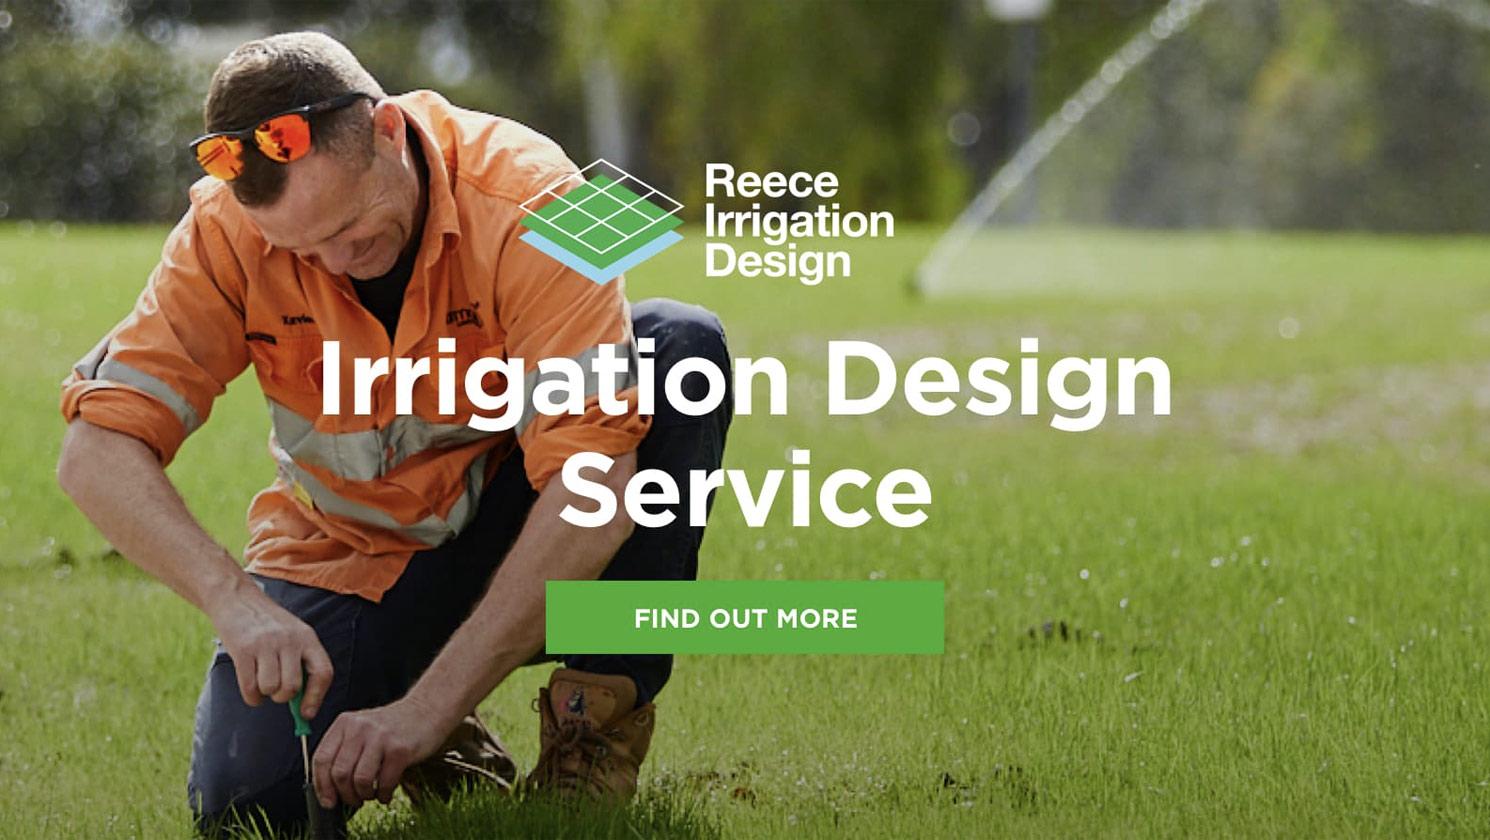 Irrigation Design Service